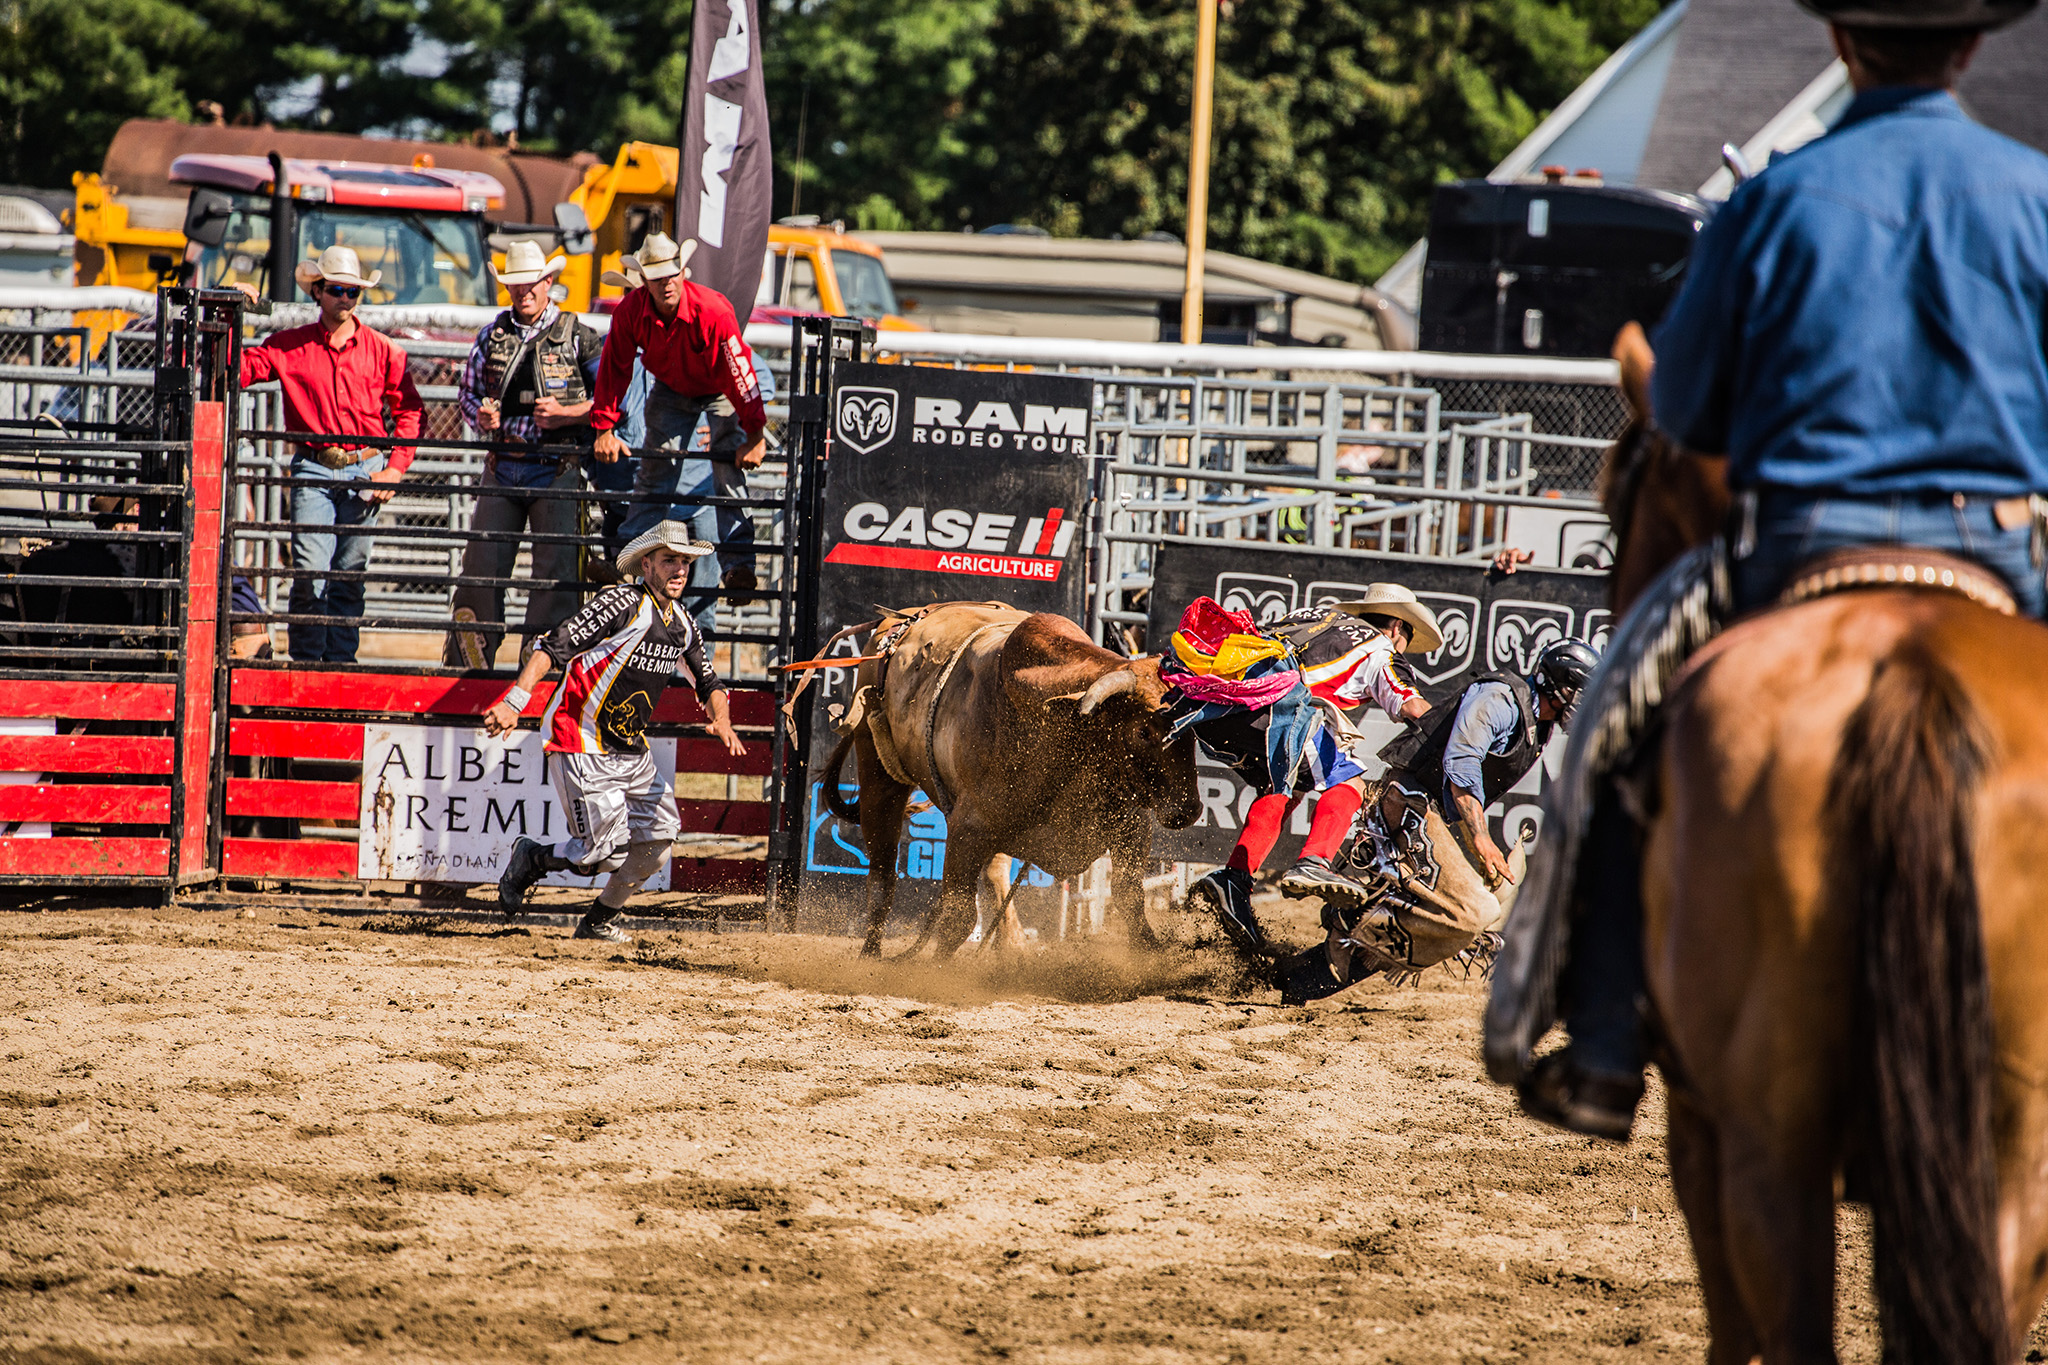 Ram Rodeo Tour - Beachburg - 23 July 2016 - 081 (2048).jpg